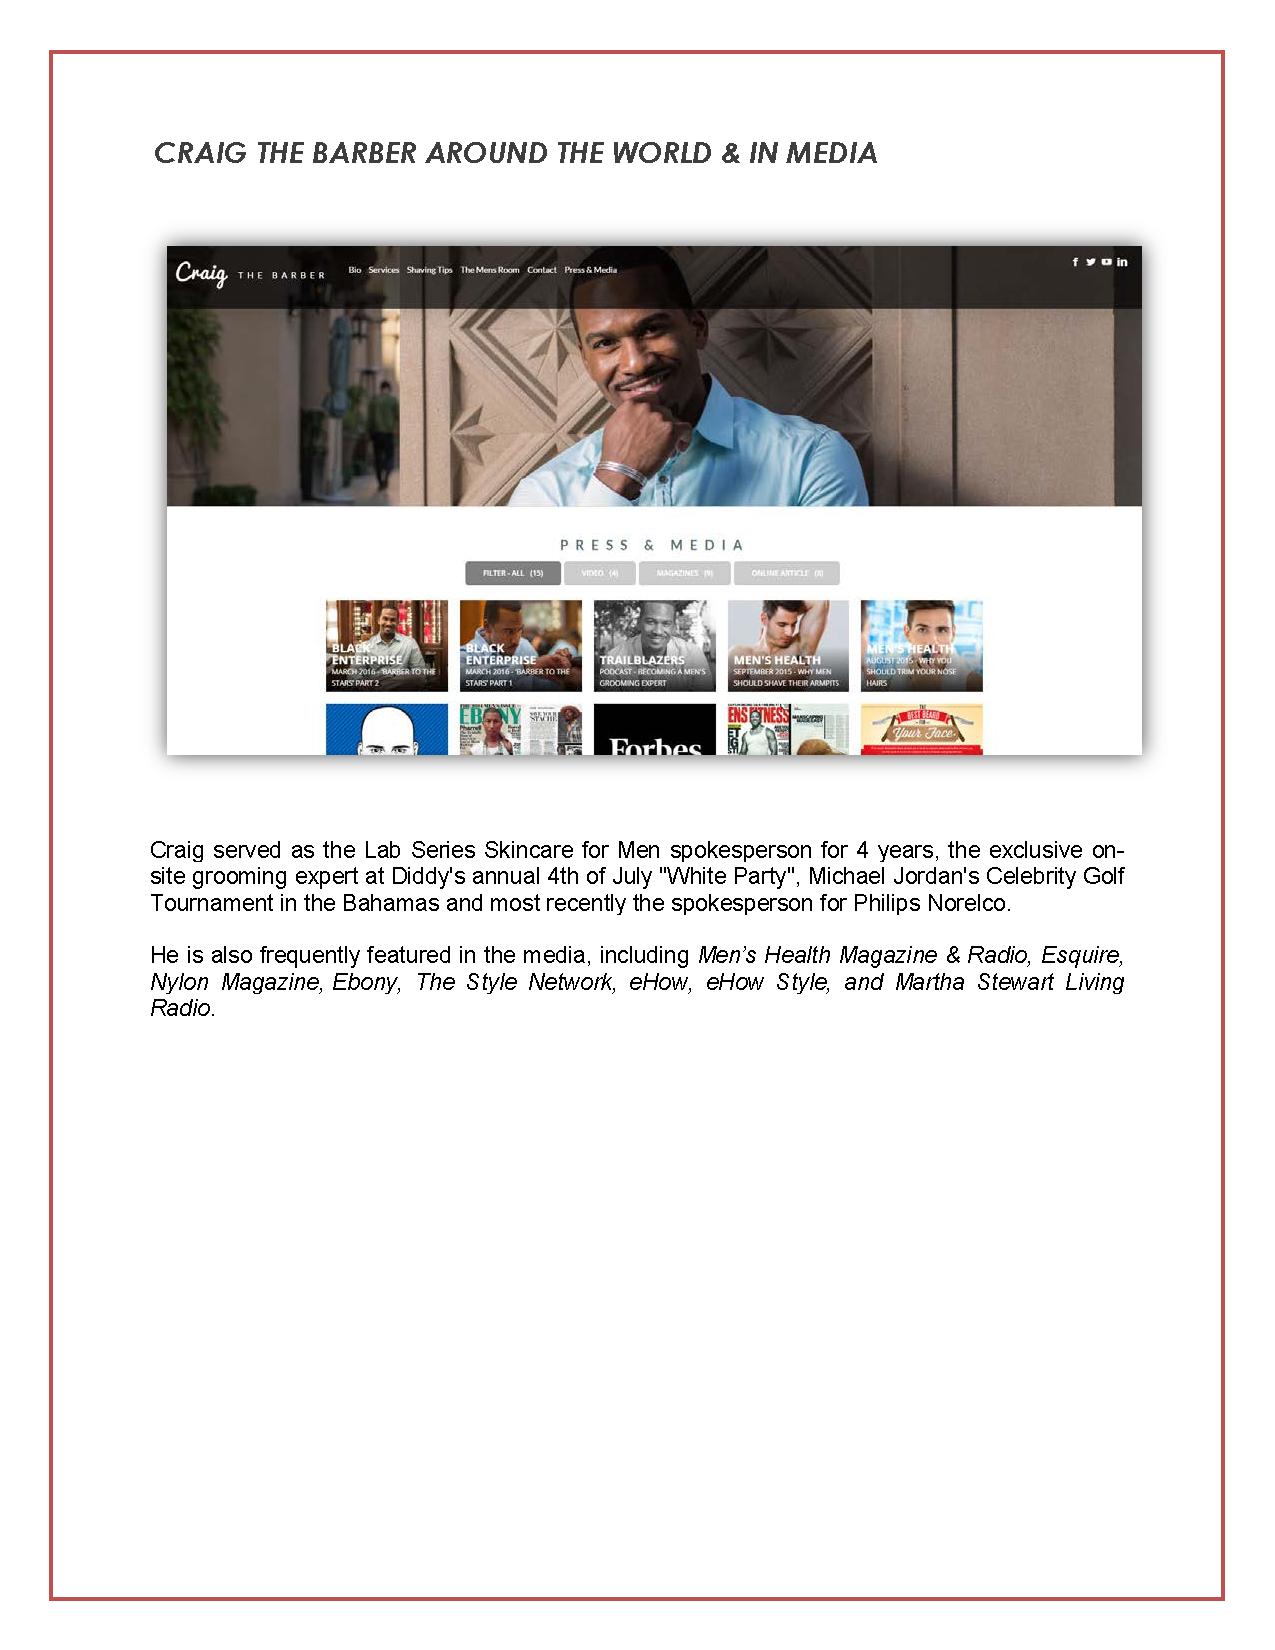 Craig the Barber Media Kit iMAGE3_Page_5